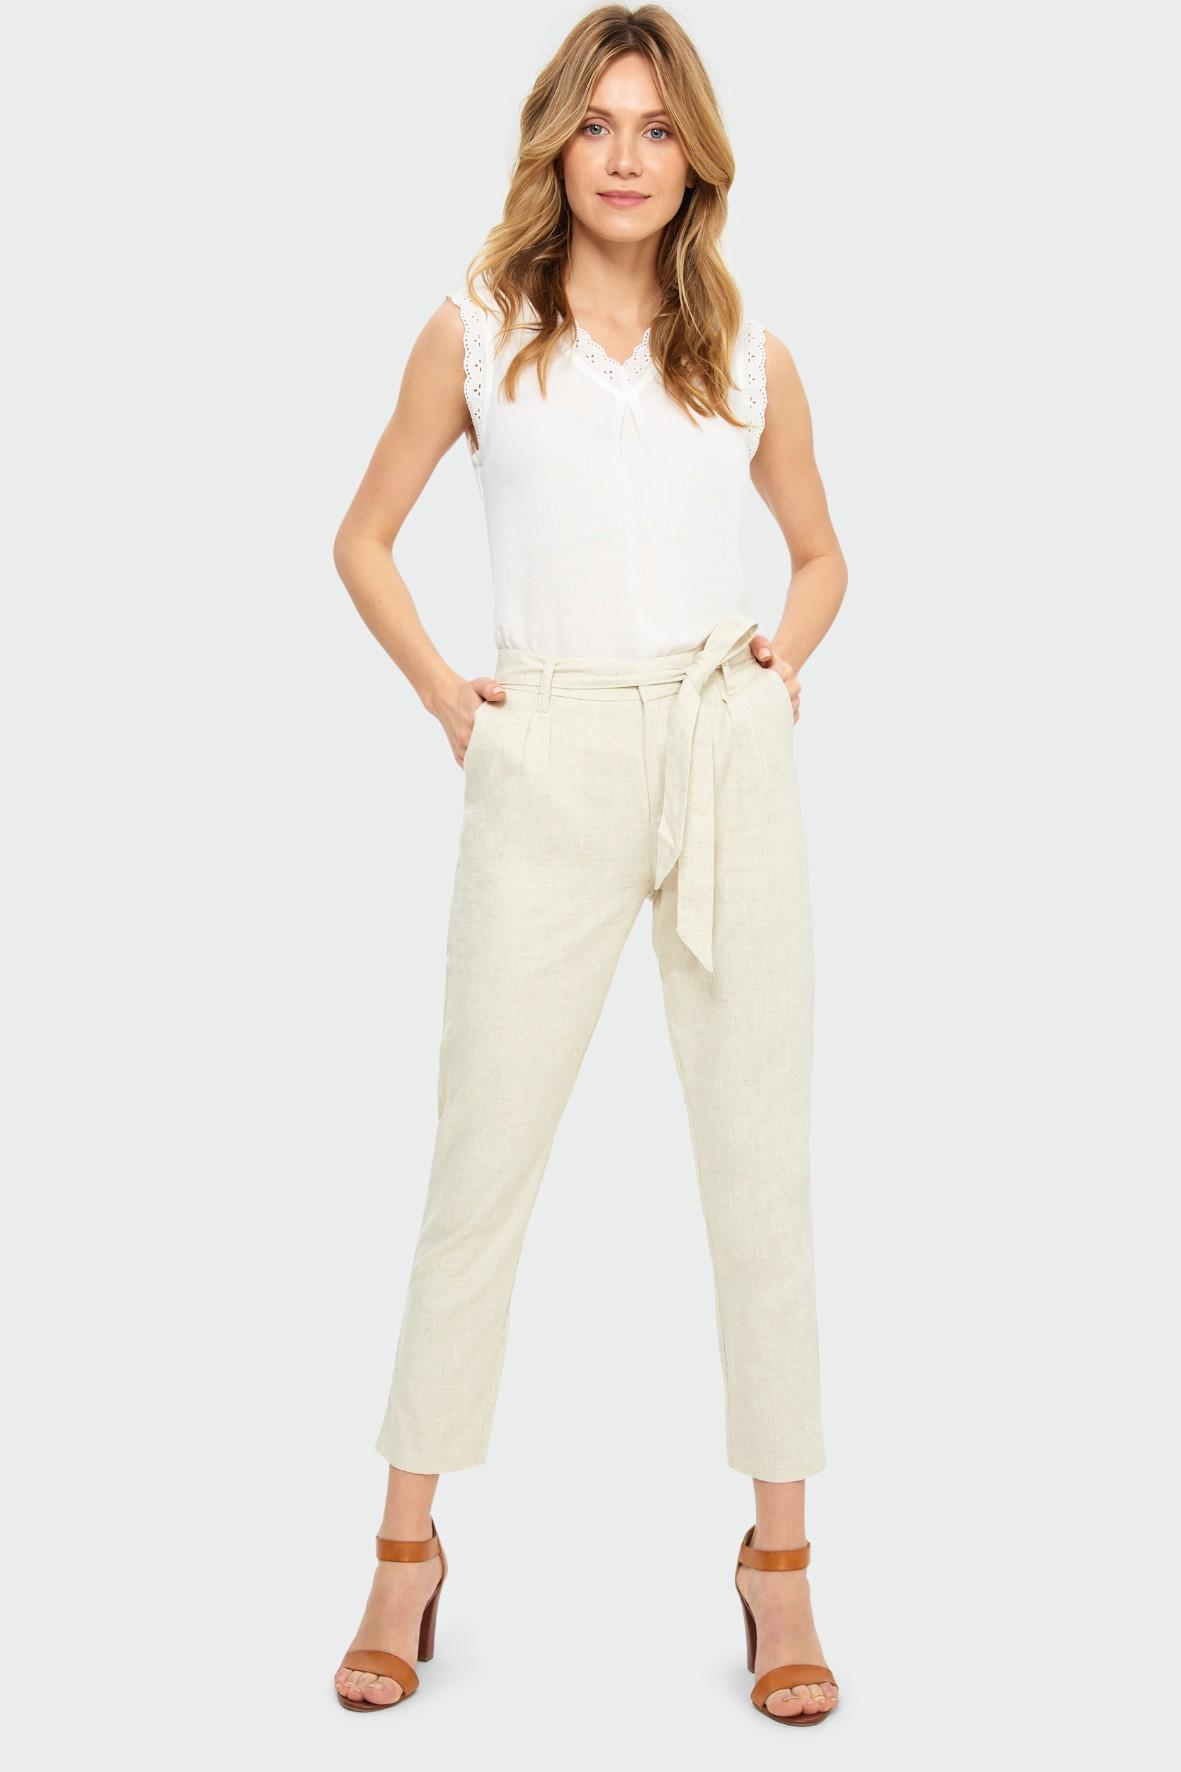 Luźne beżowe spodnie z paskiem